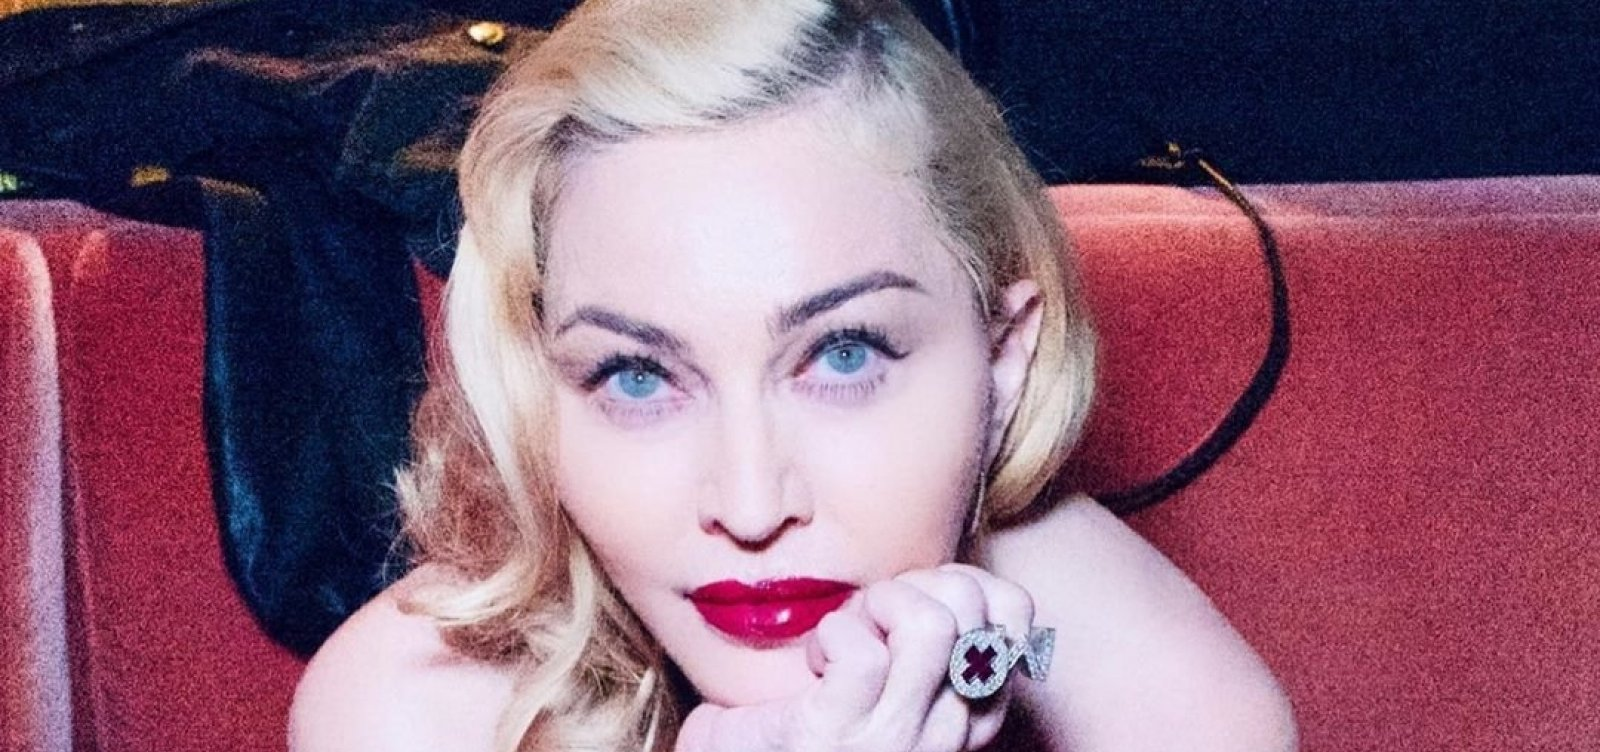 [Madonna diz que seu teste mostrou anticorpos do coronavírus: 'Vou respirar Covid-19']